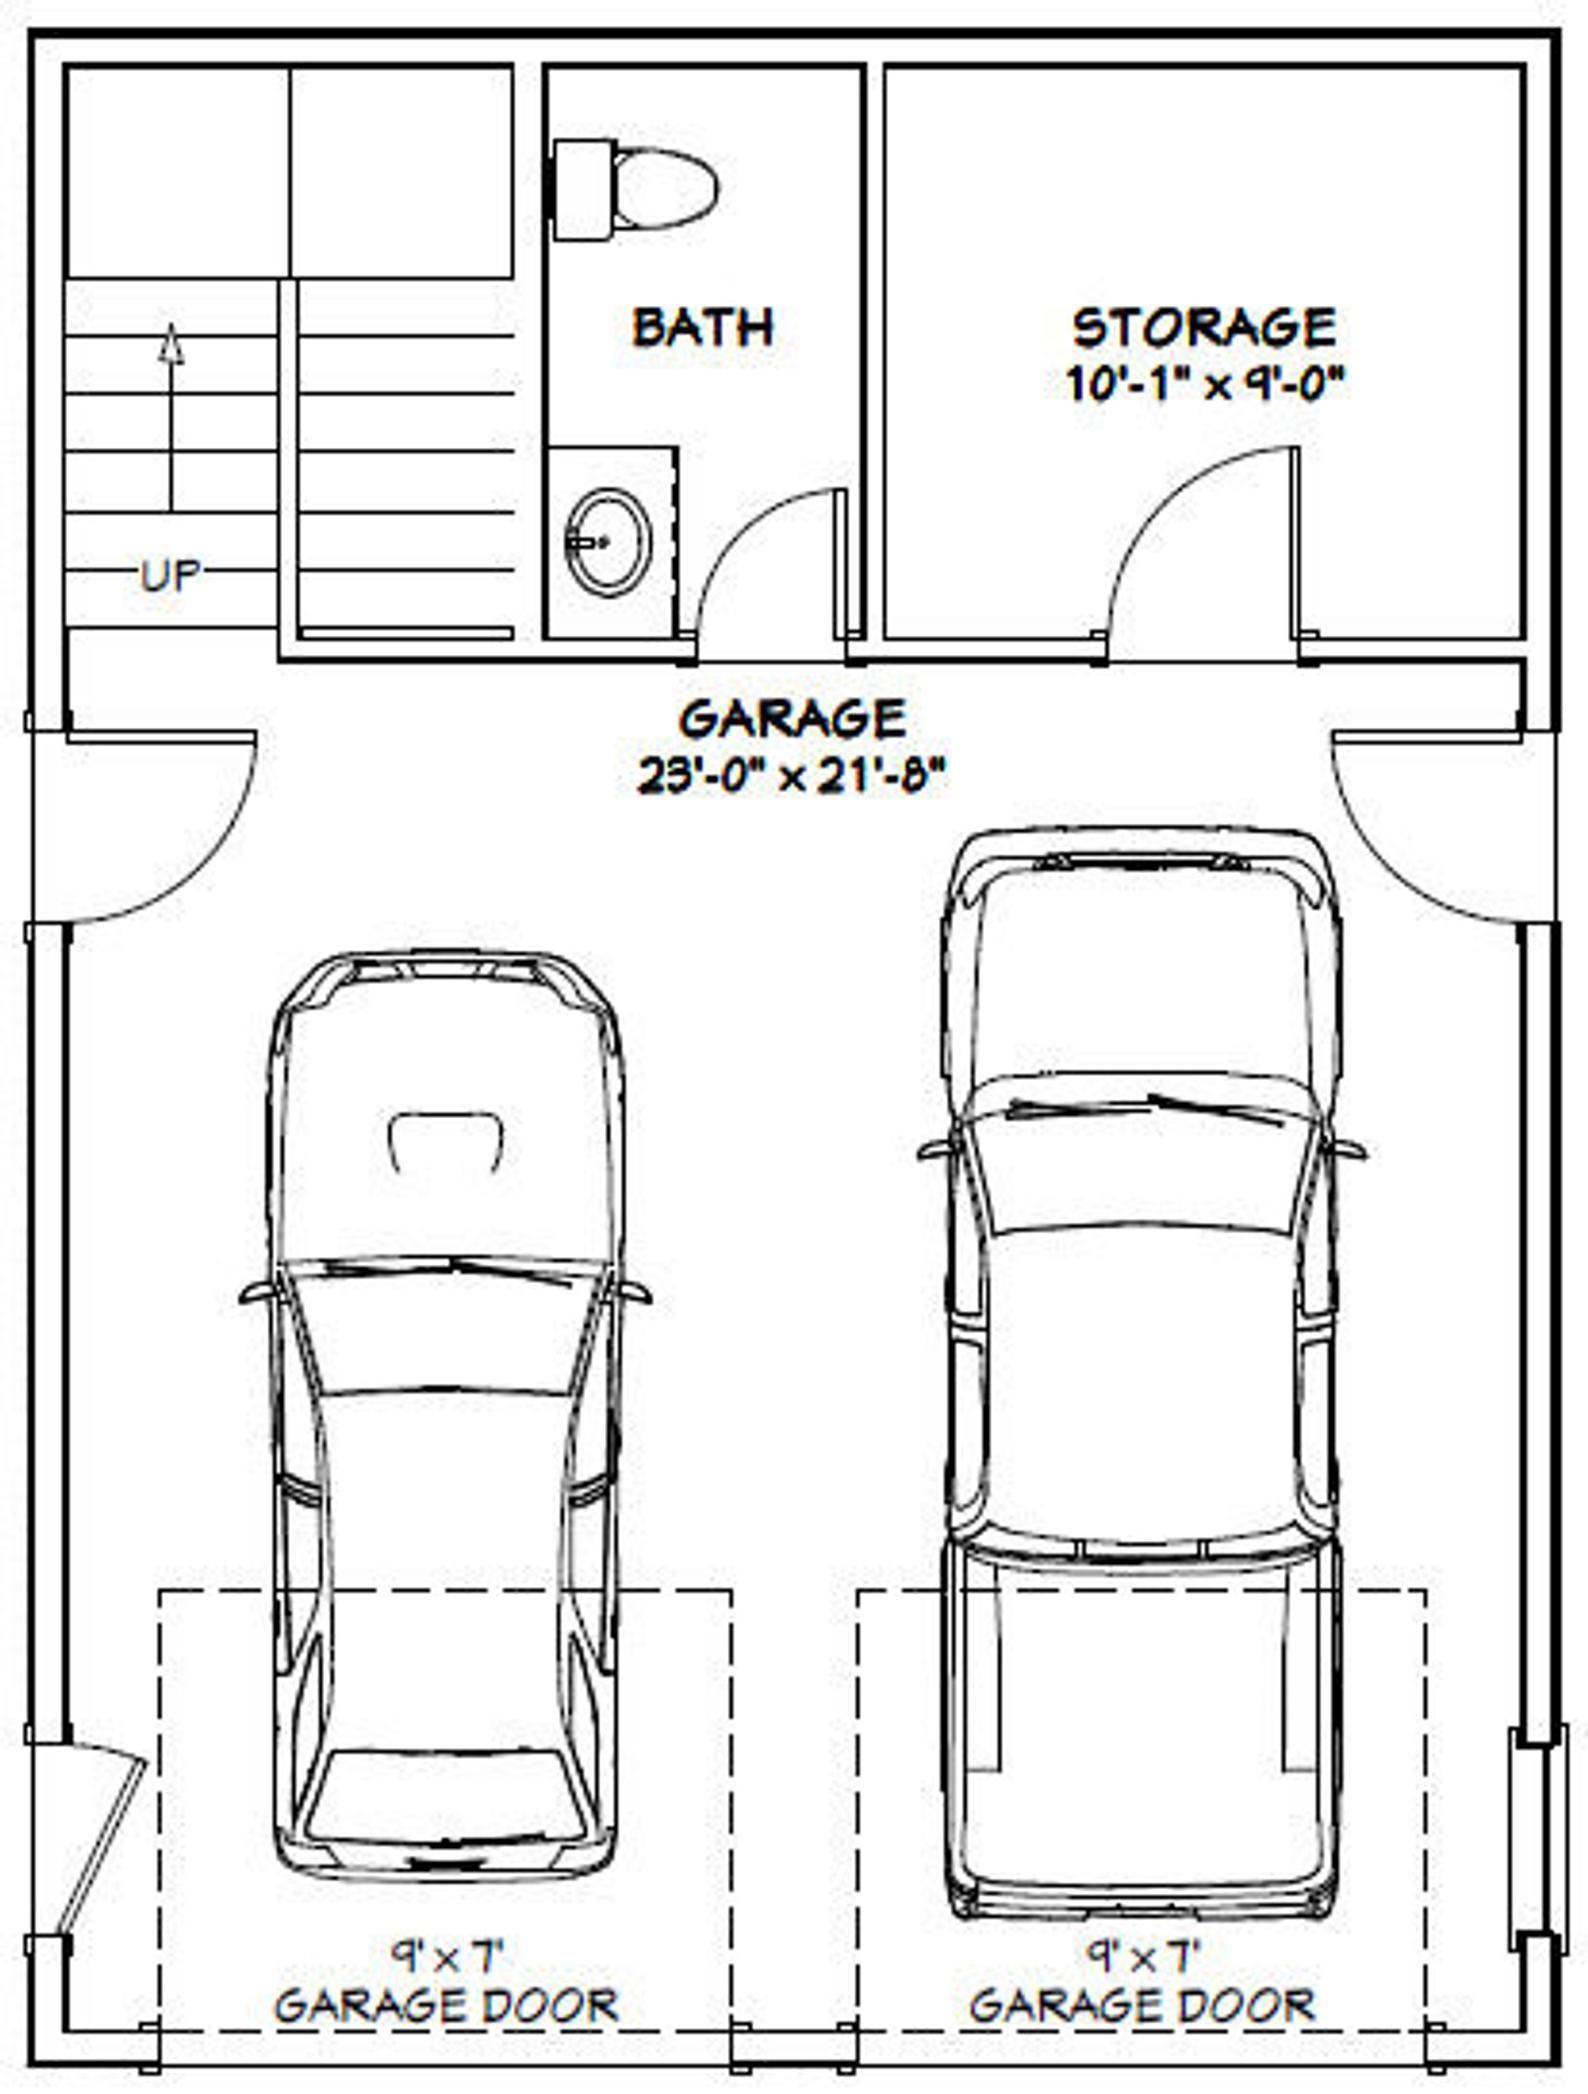 24x32 house 1 bedroom 15 bath 830 sq ft pdf floor  etsy